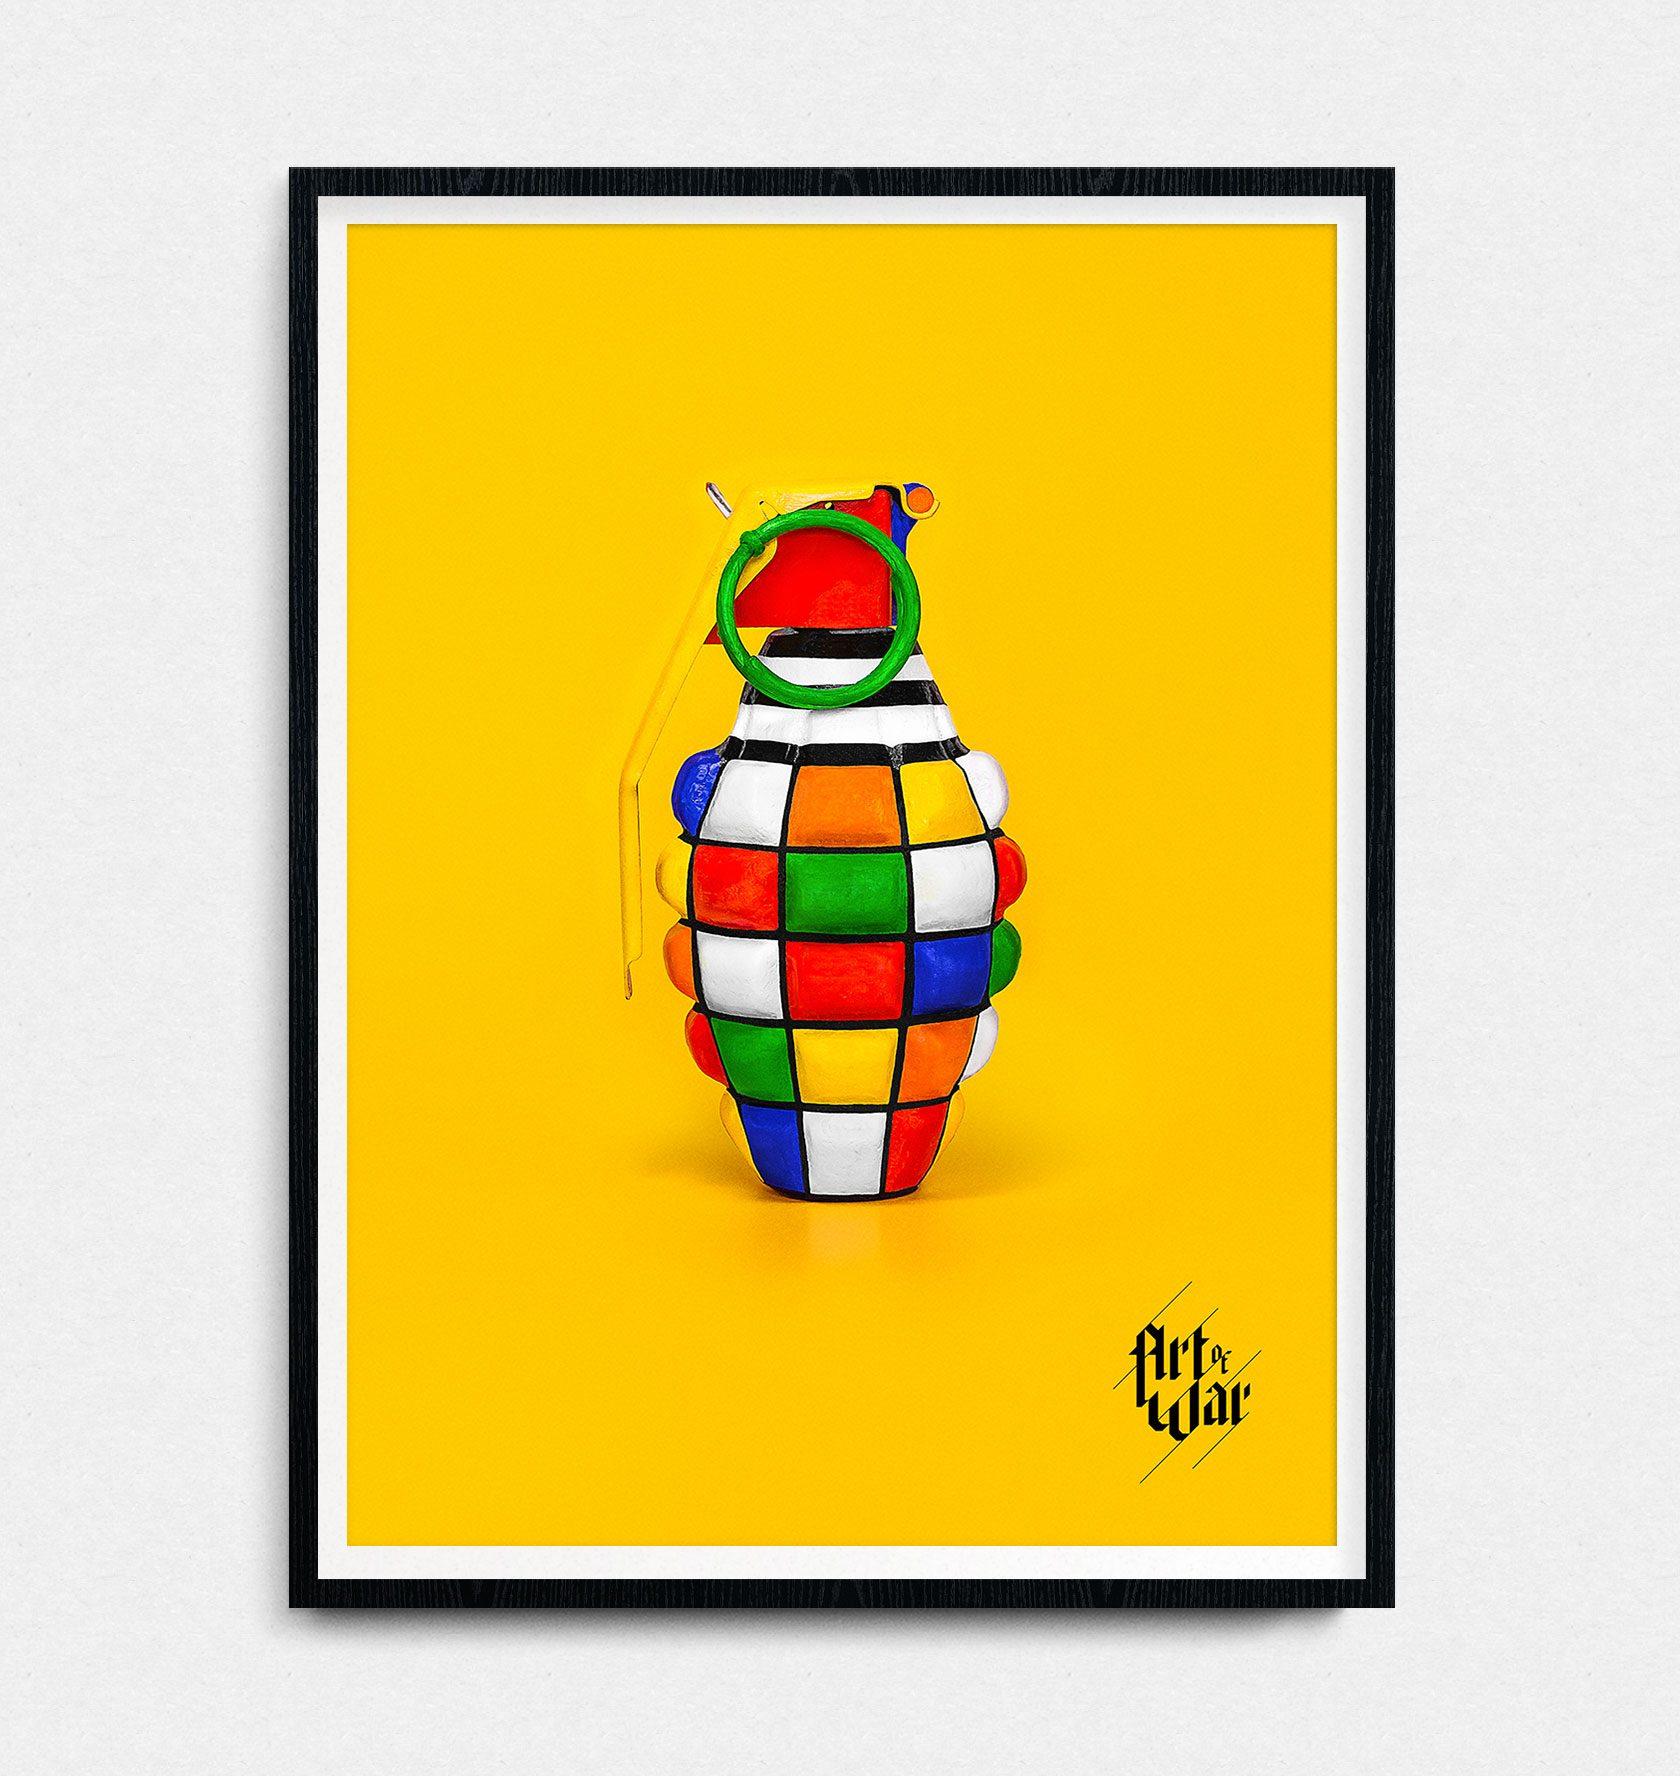 Art of War Grenade Poster Design by Furia